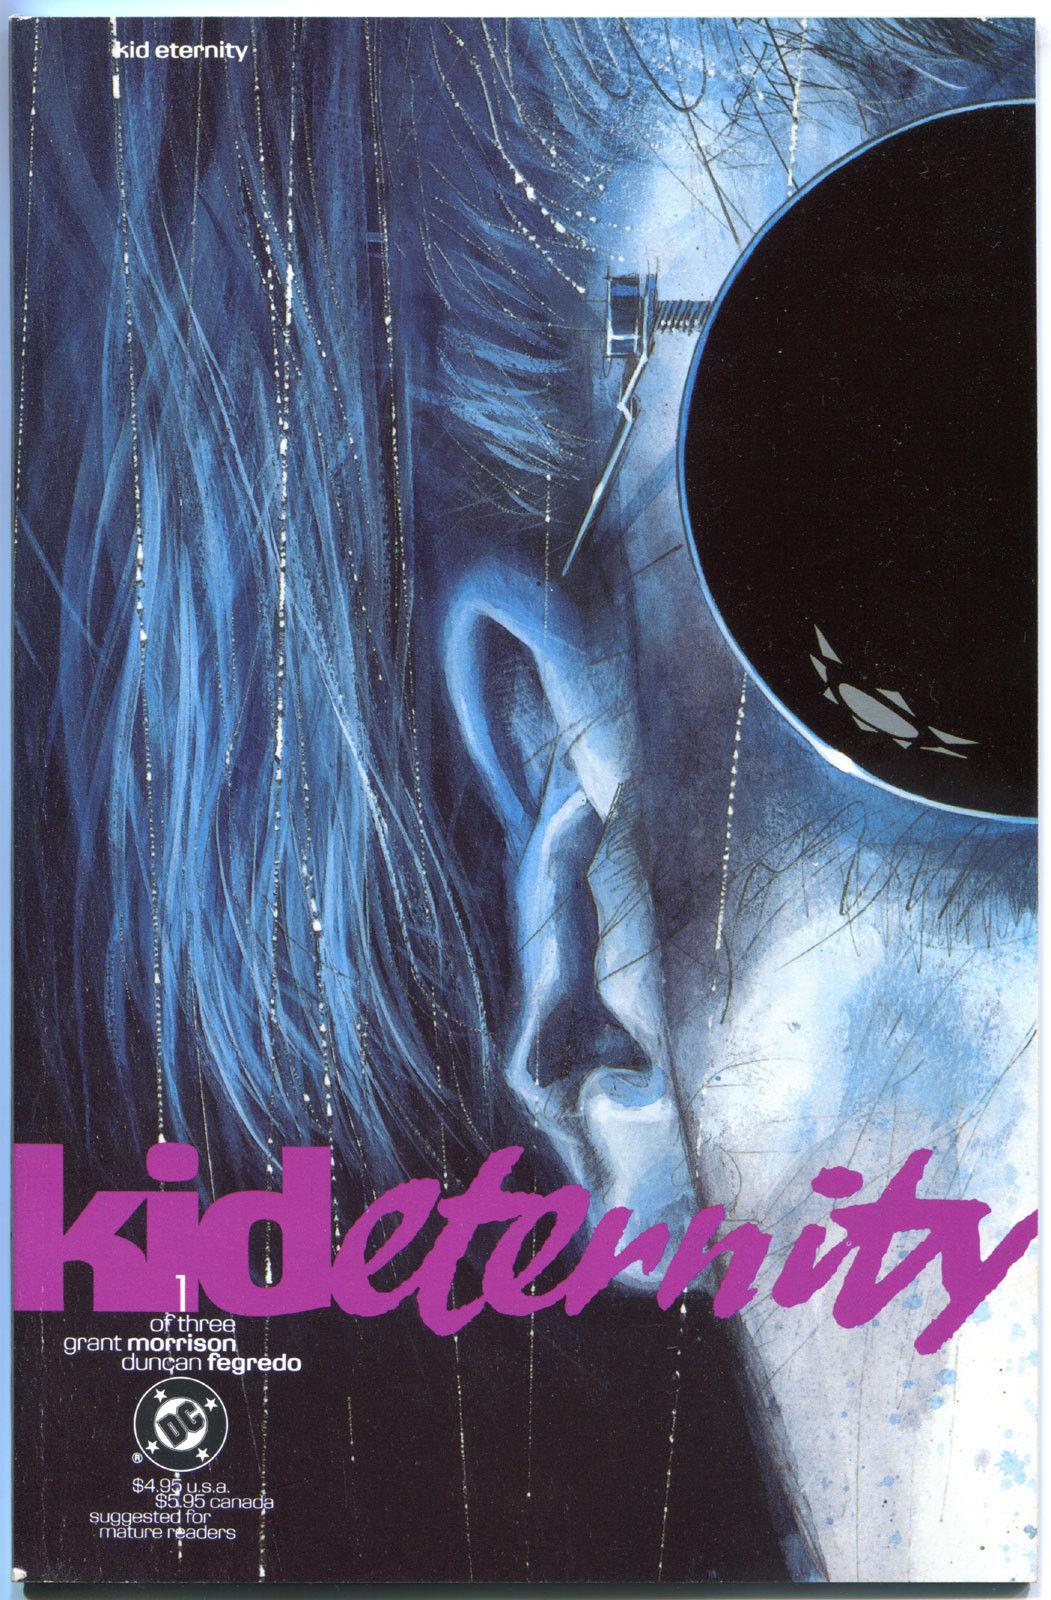 KID ETERNITY #1 2 3, NM, 3 issues,1991, Grant Morrison, Fegredo,more DC in store